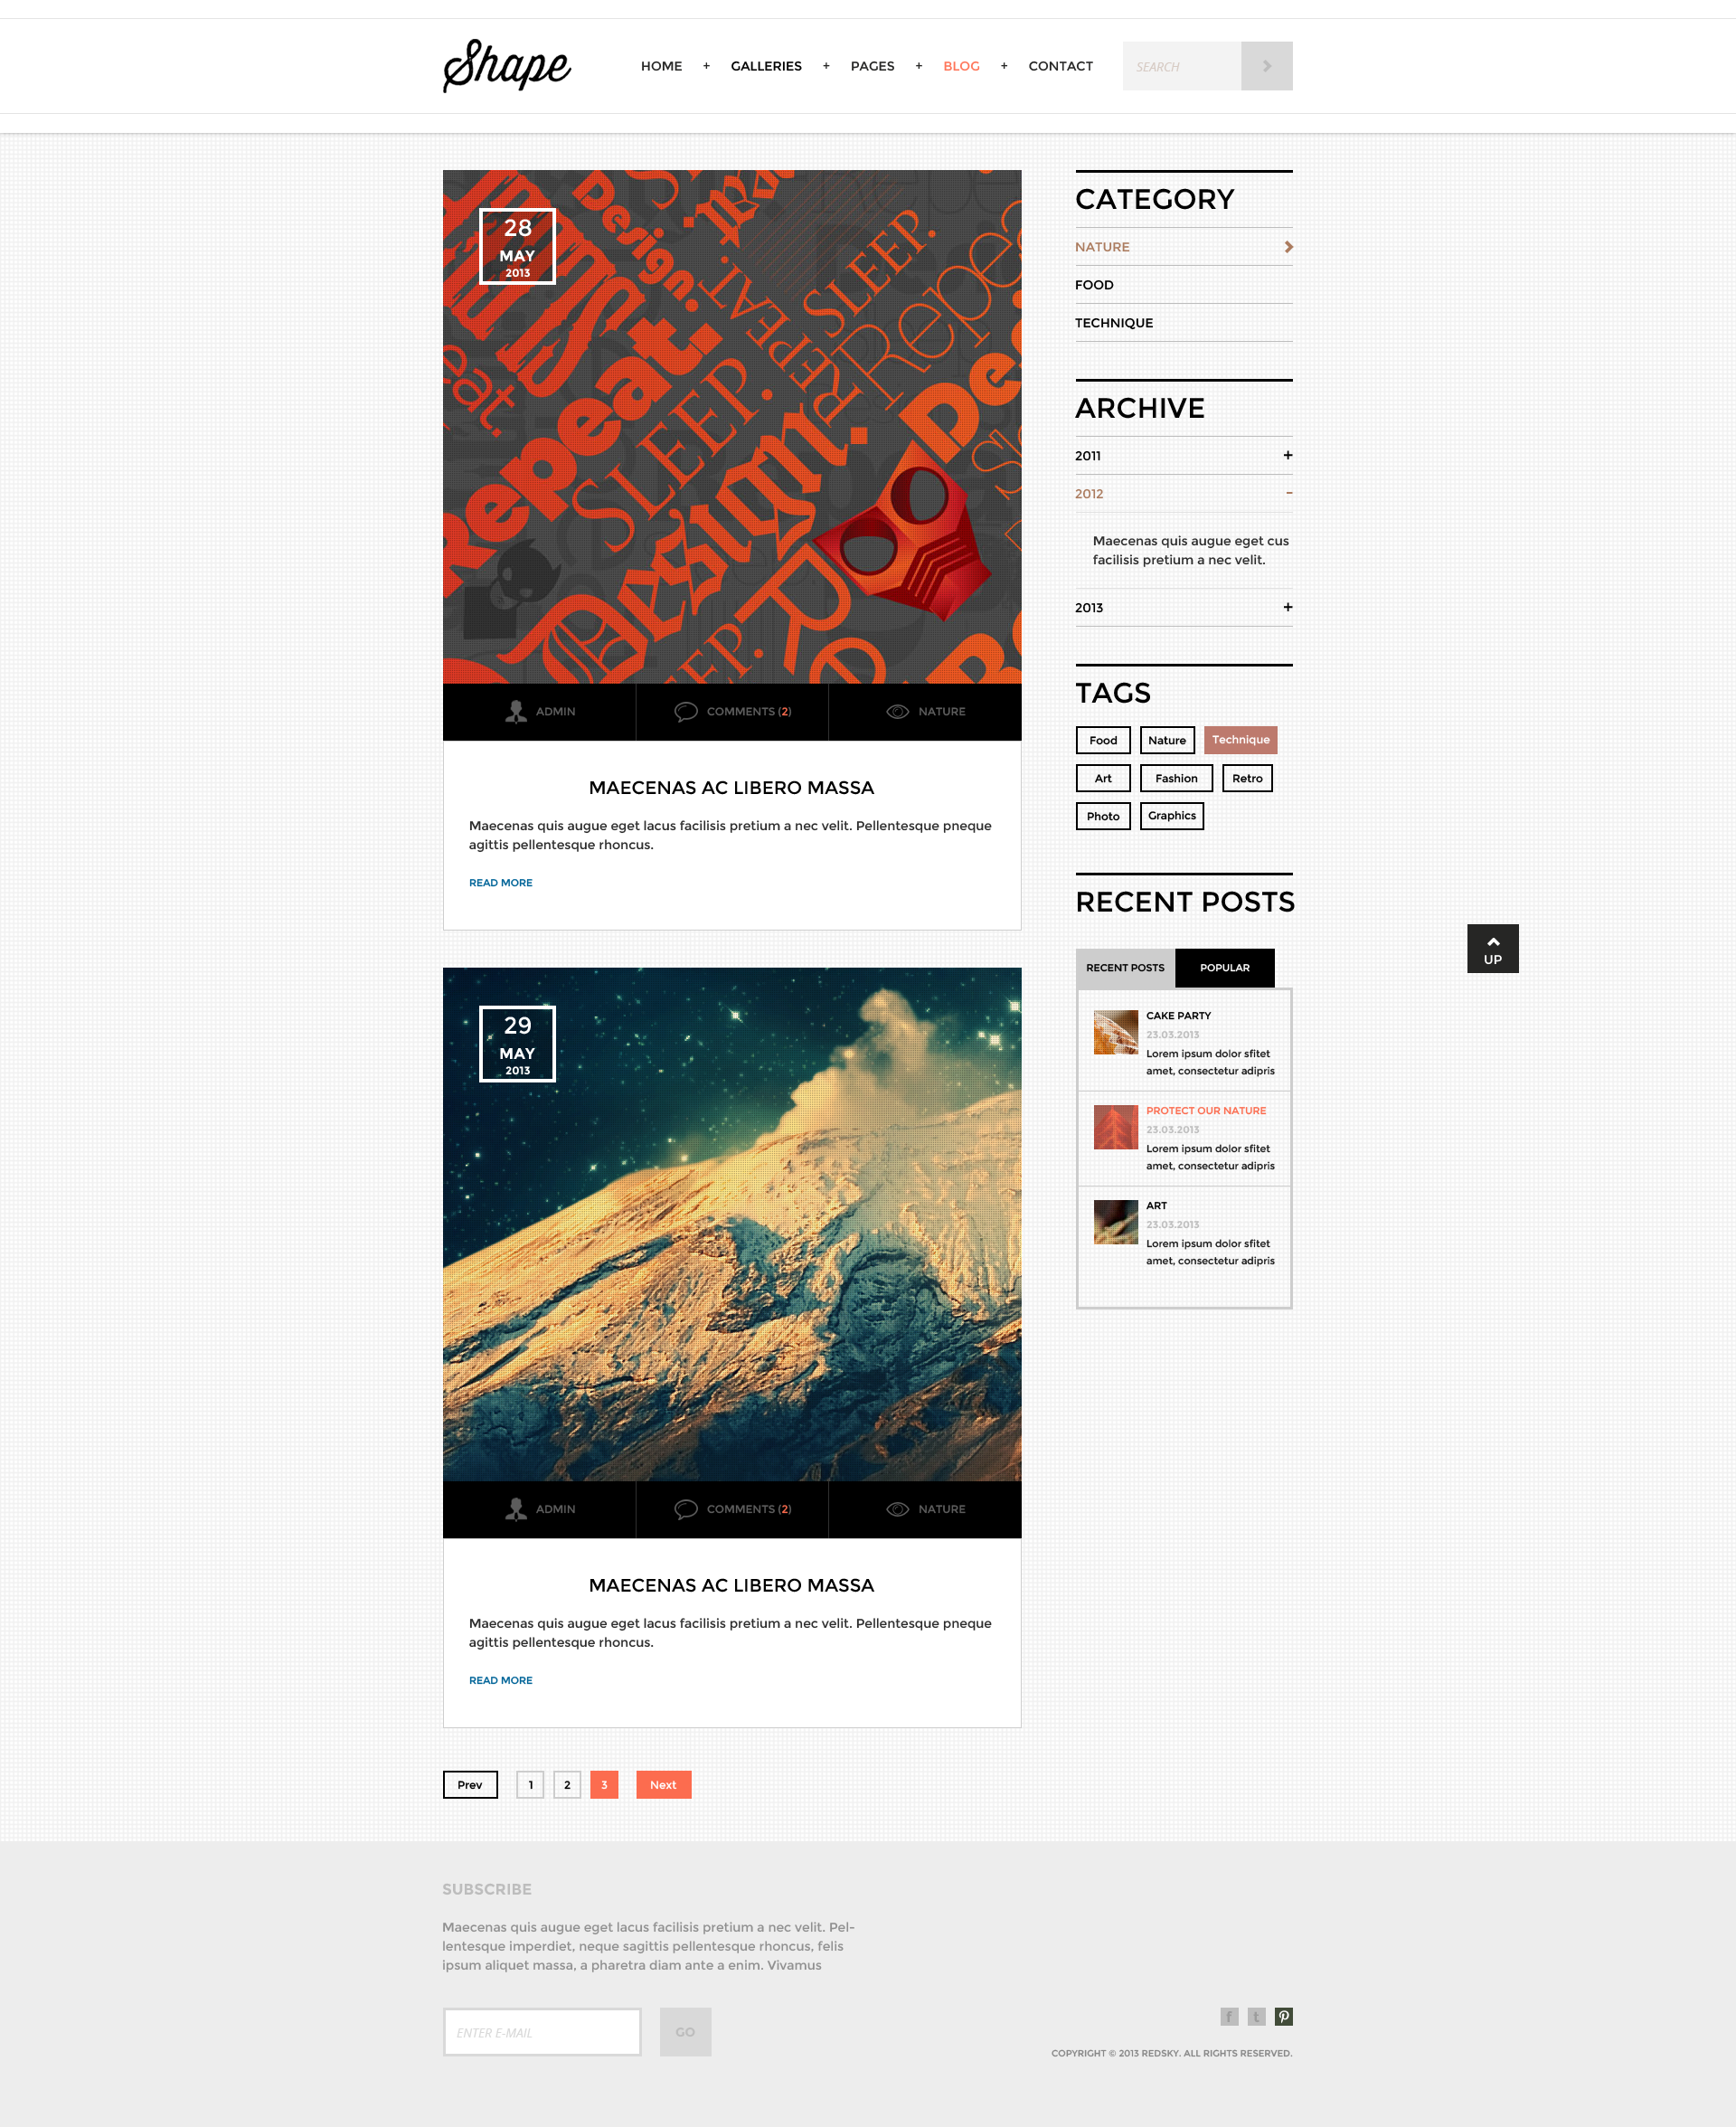 Shape - Professional HTML Photography Theme